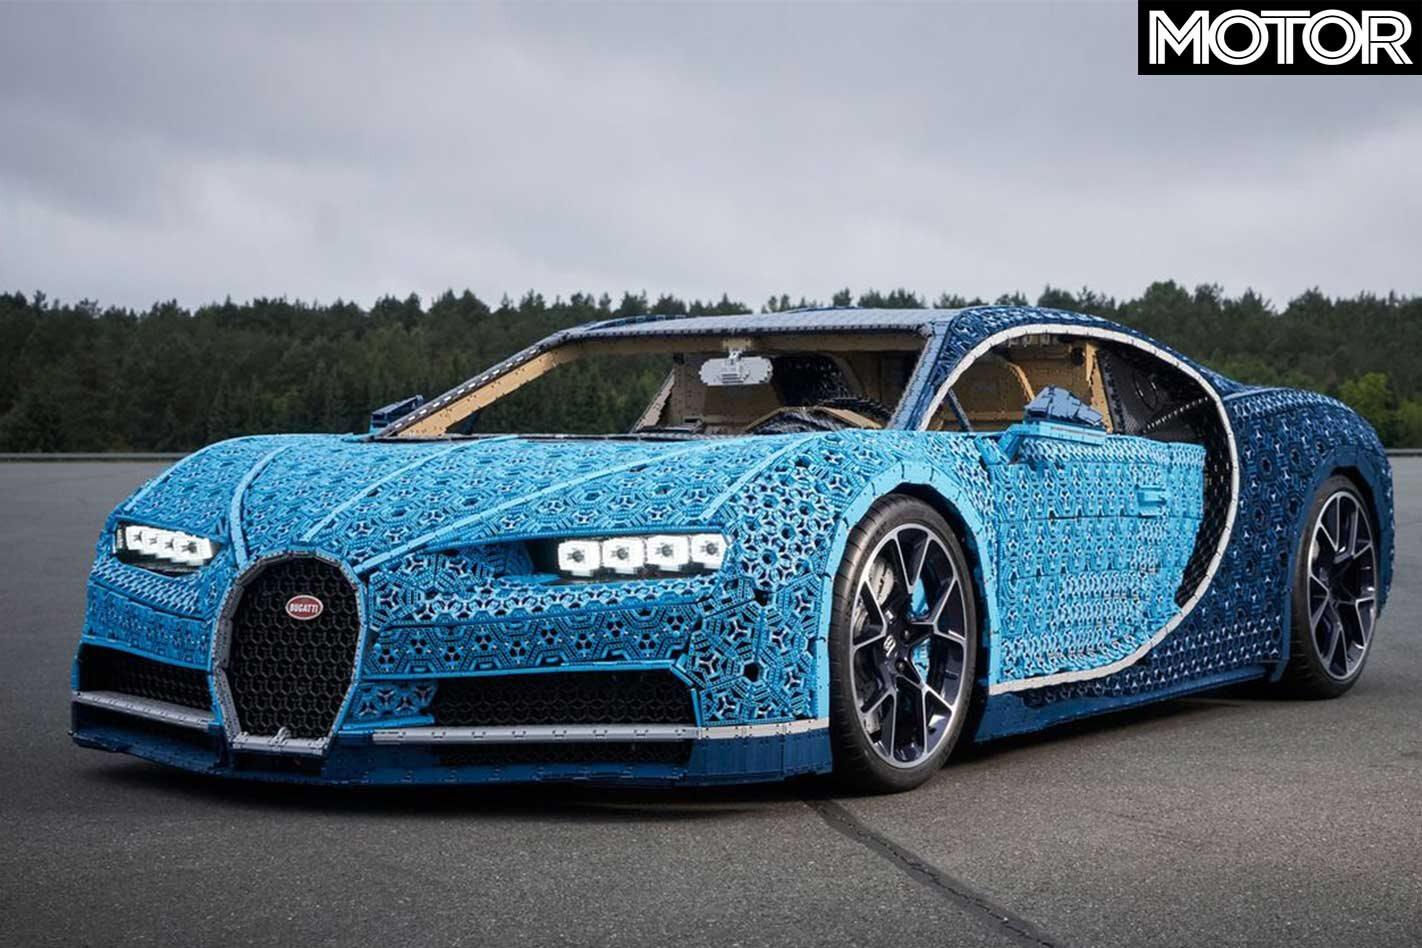 LEGO Life Sized Bugatti Chiron Front 281 29 Jpg